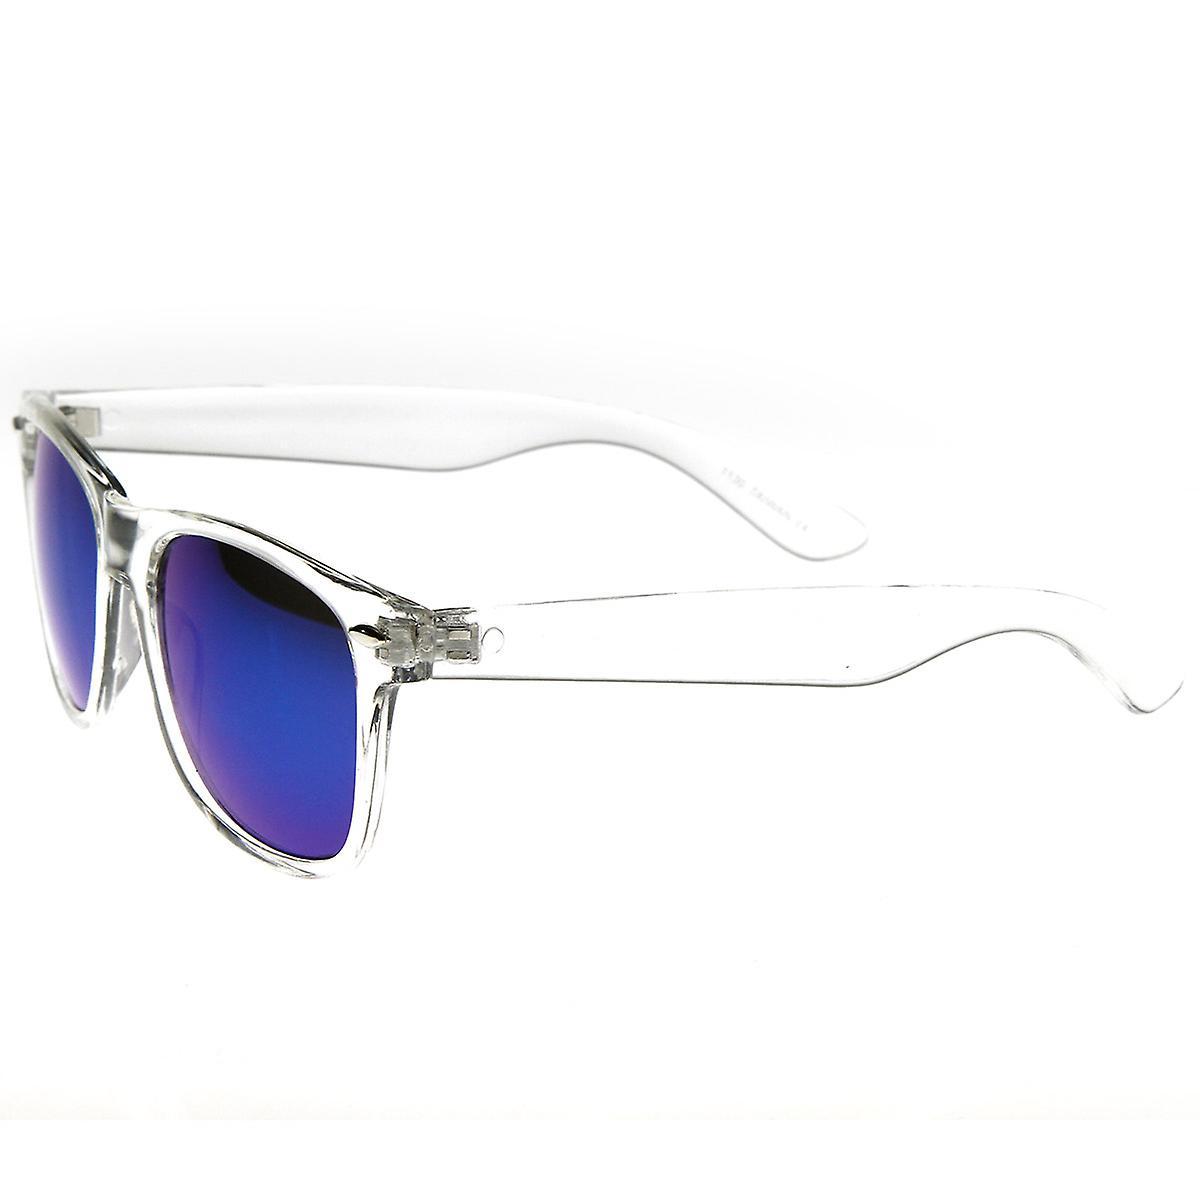 Flat Matte Reflective Revo Color Lens Large Horn Rimmed Style Sunglasses